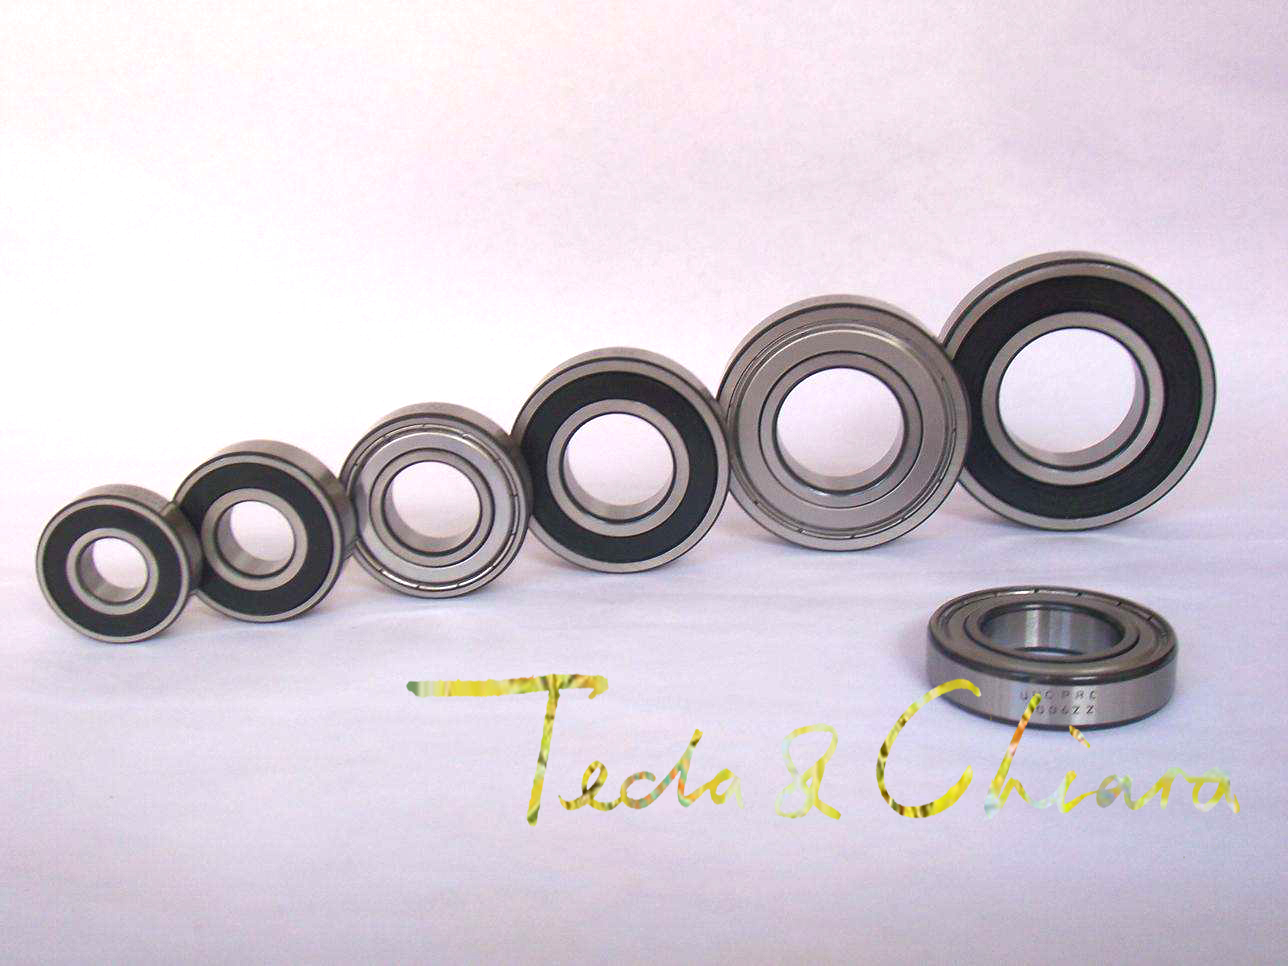 673-2Z 673ZZ MR63 MR63ZZ MR63RS MR63-2Z MR63Z MR63-2RS ZZ RS RZ 2RZ Deep Groove Ball Bearings 3 X 6 X 2.5mm High Quality